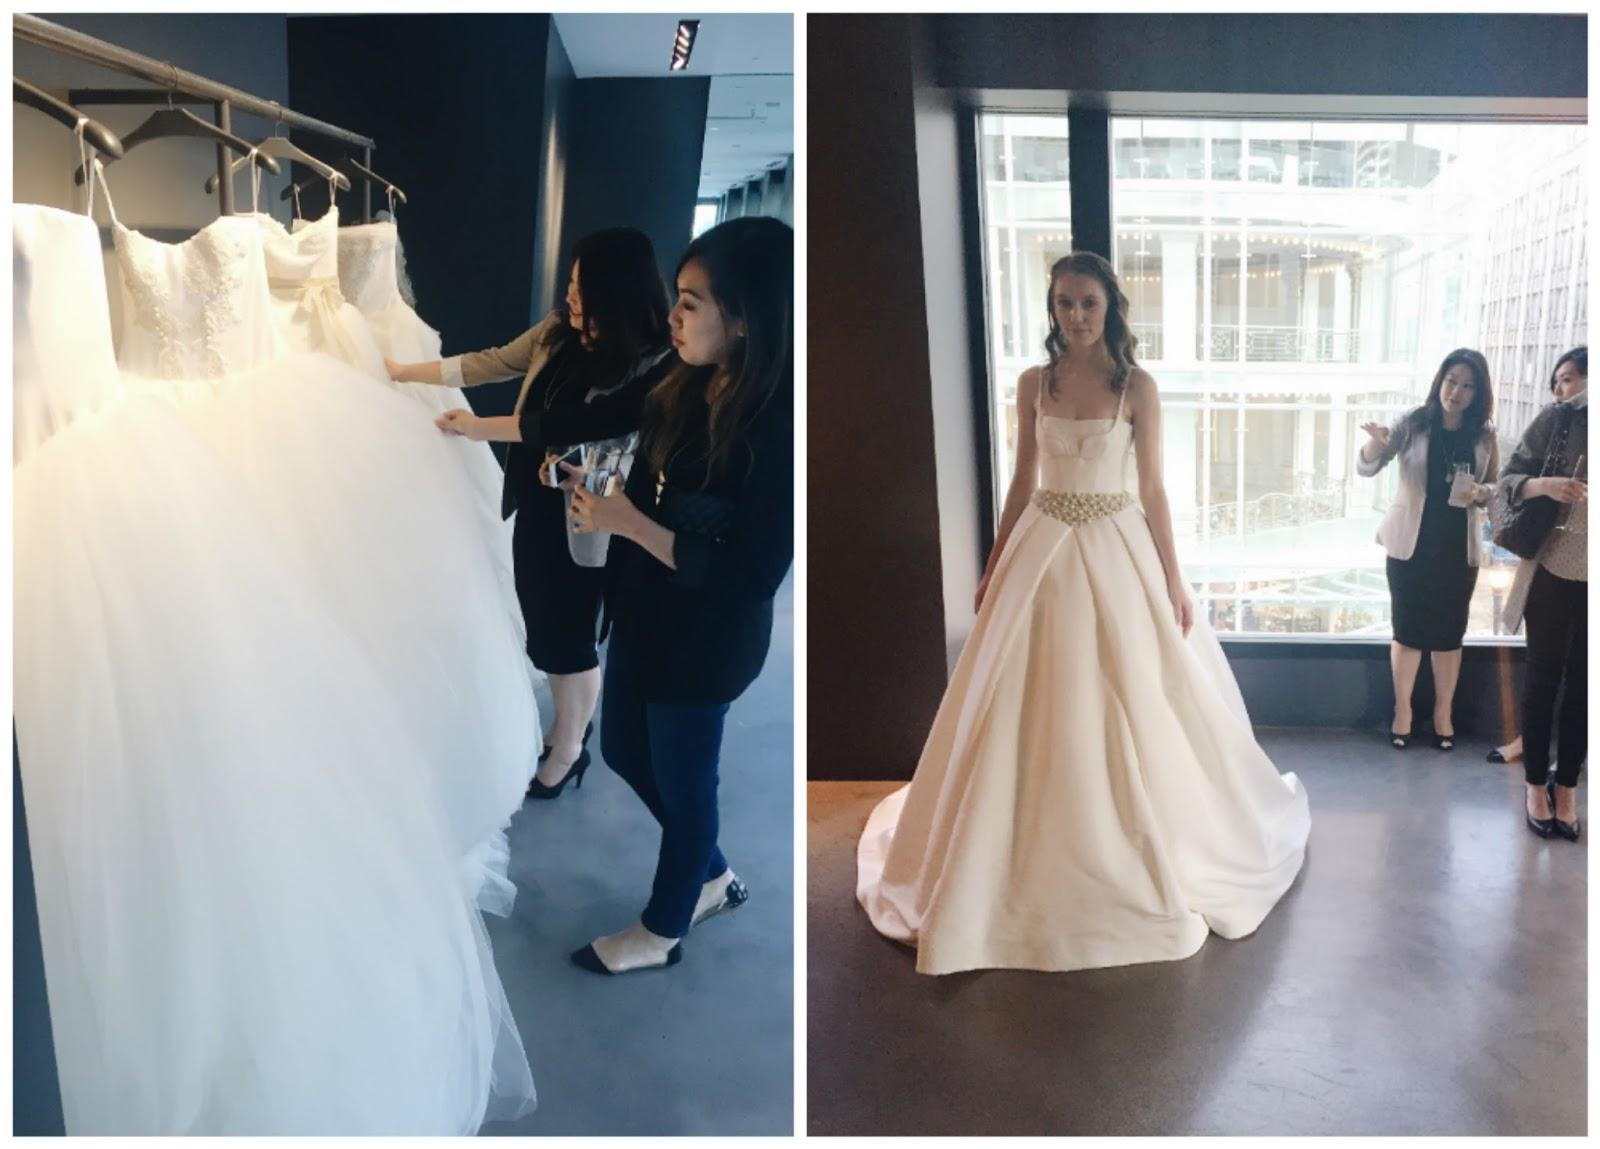 Wedding Dress Shops San Francisco 93 Stunning It was a fine